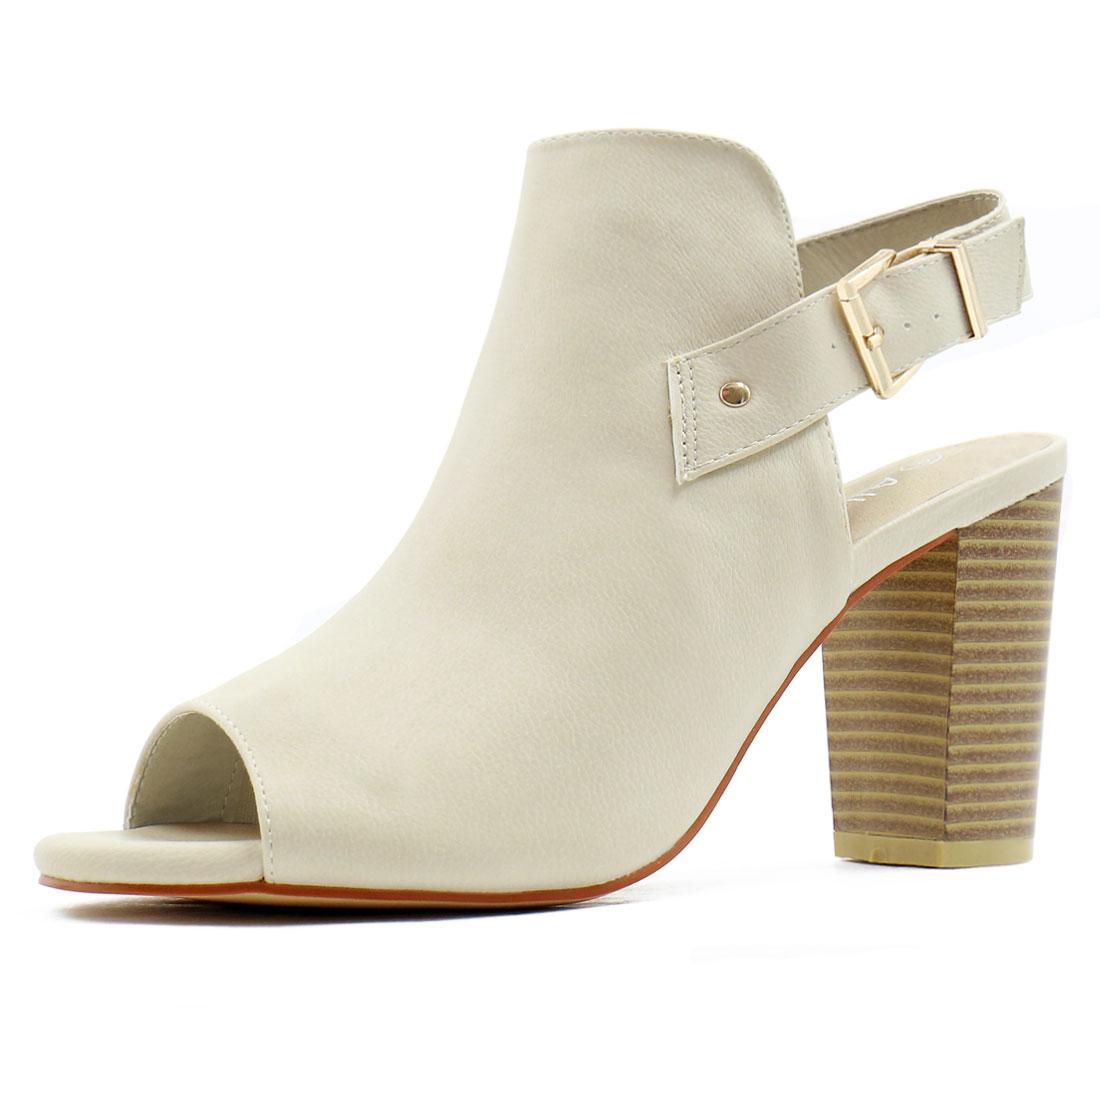 Women Peep Toe Slip On Stacked Heel Slingback Sandals Ivory US 7